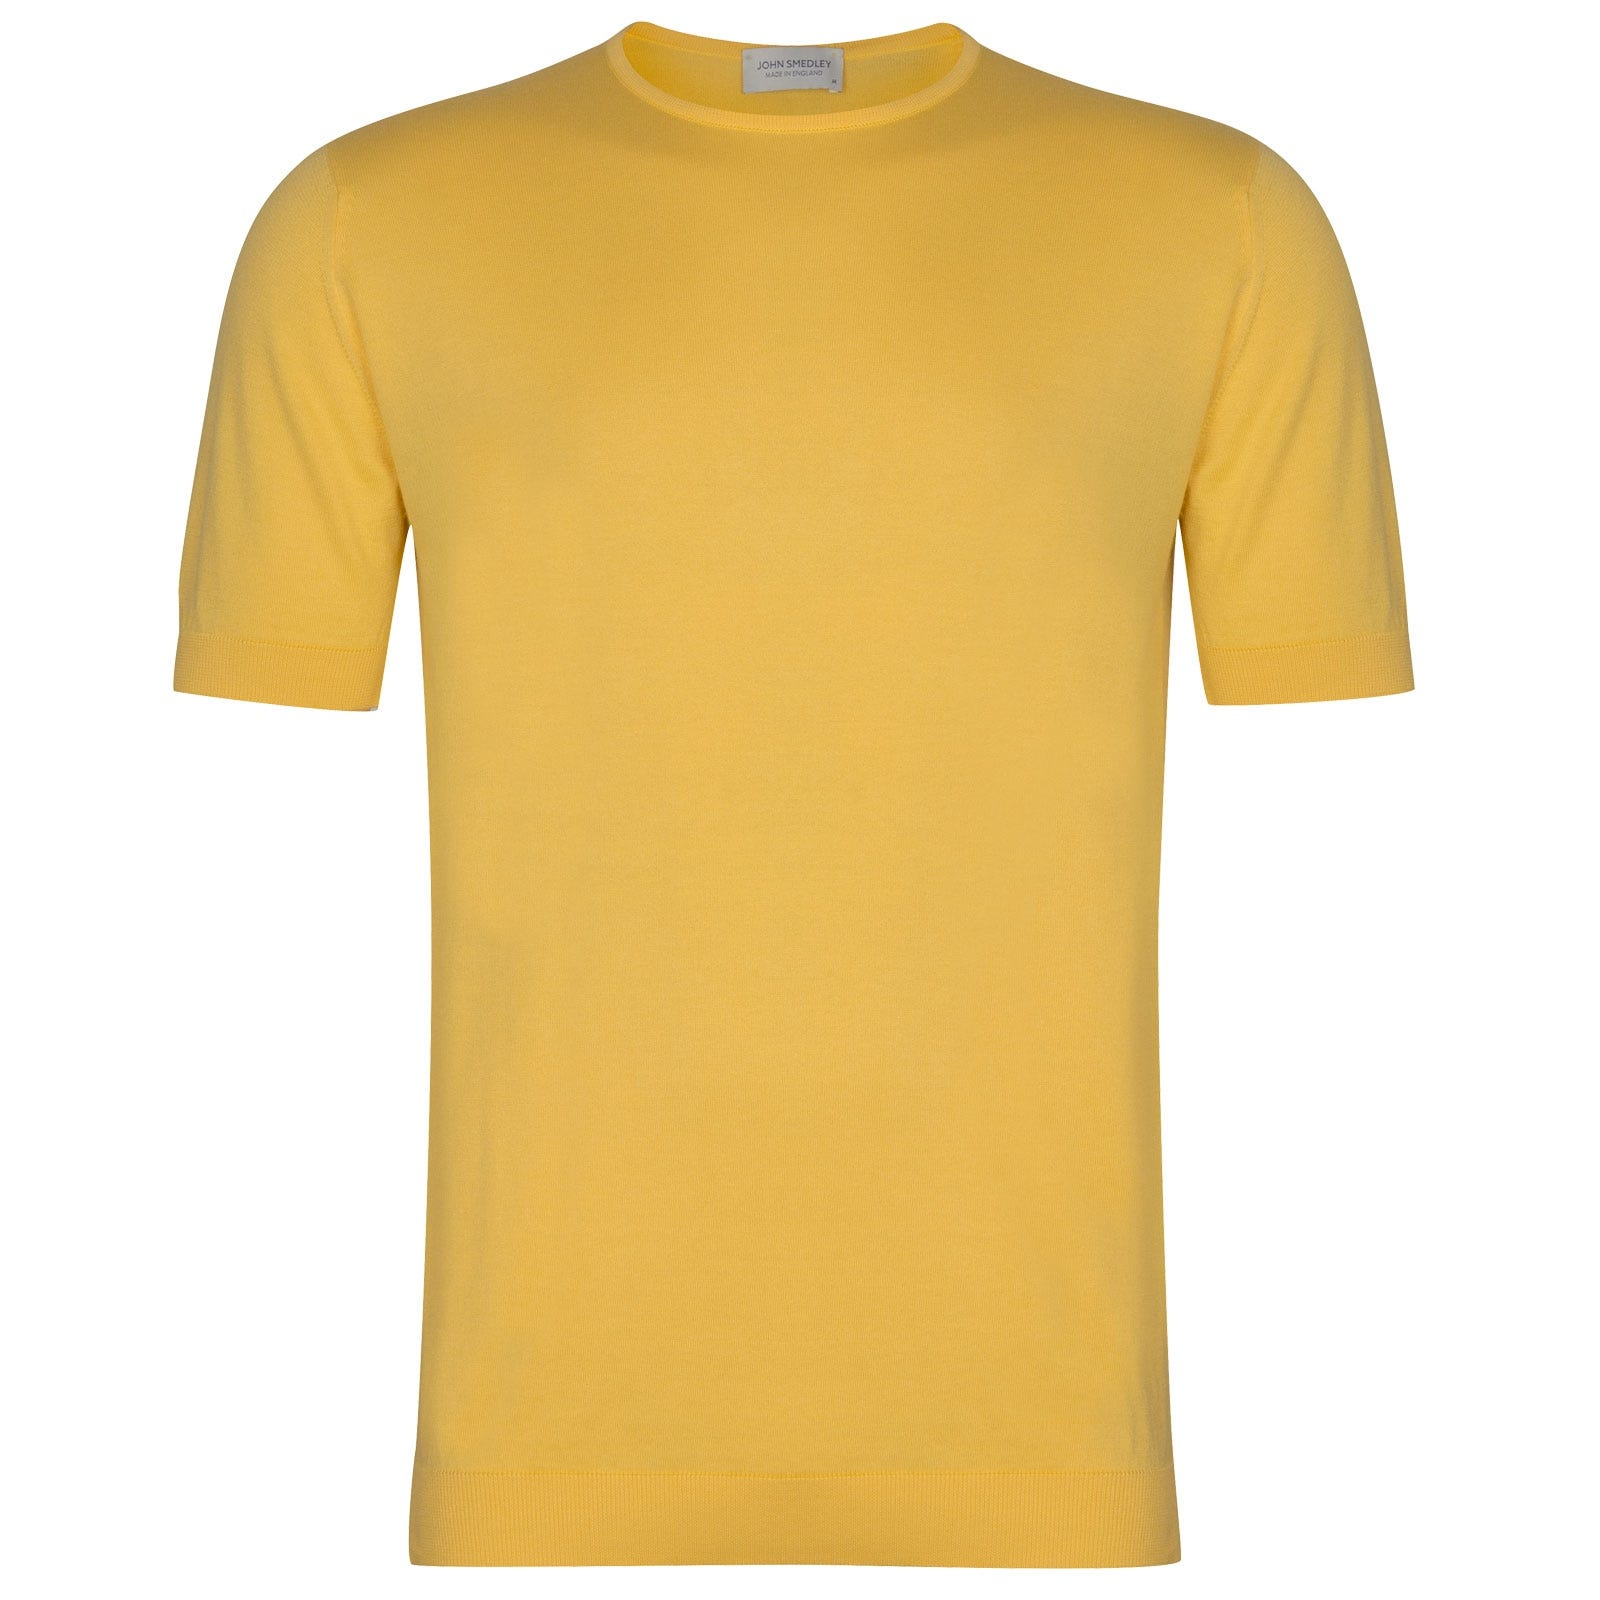 John Smedley Belden in Yellow Bloom T-Shirt-MED